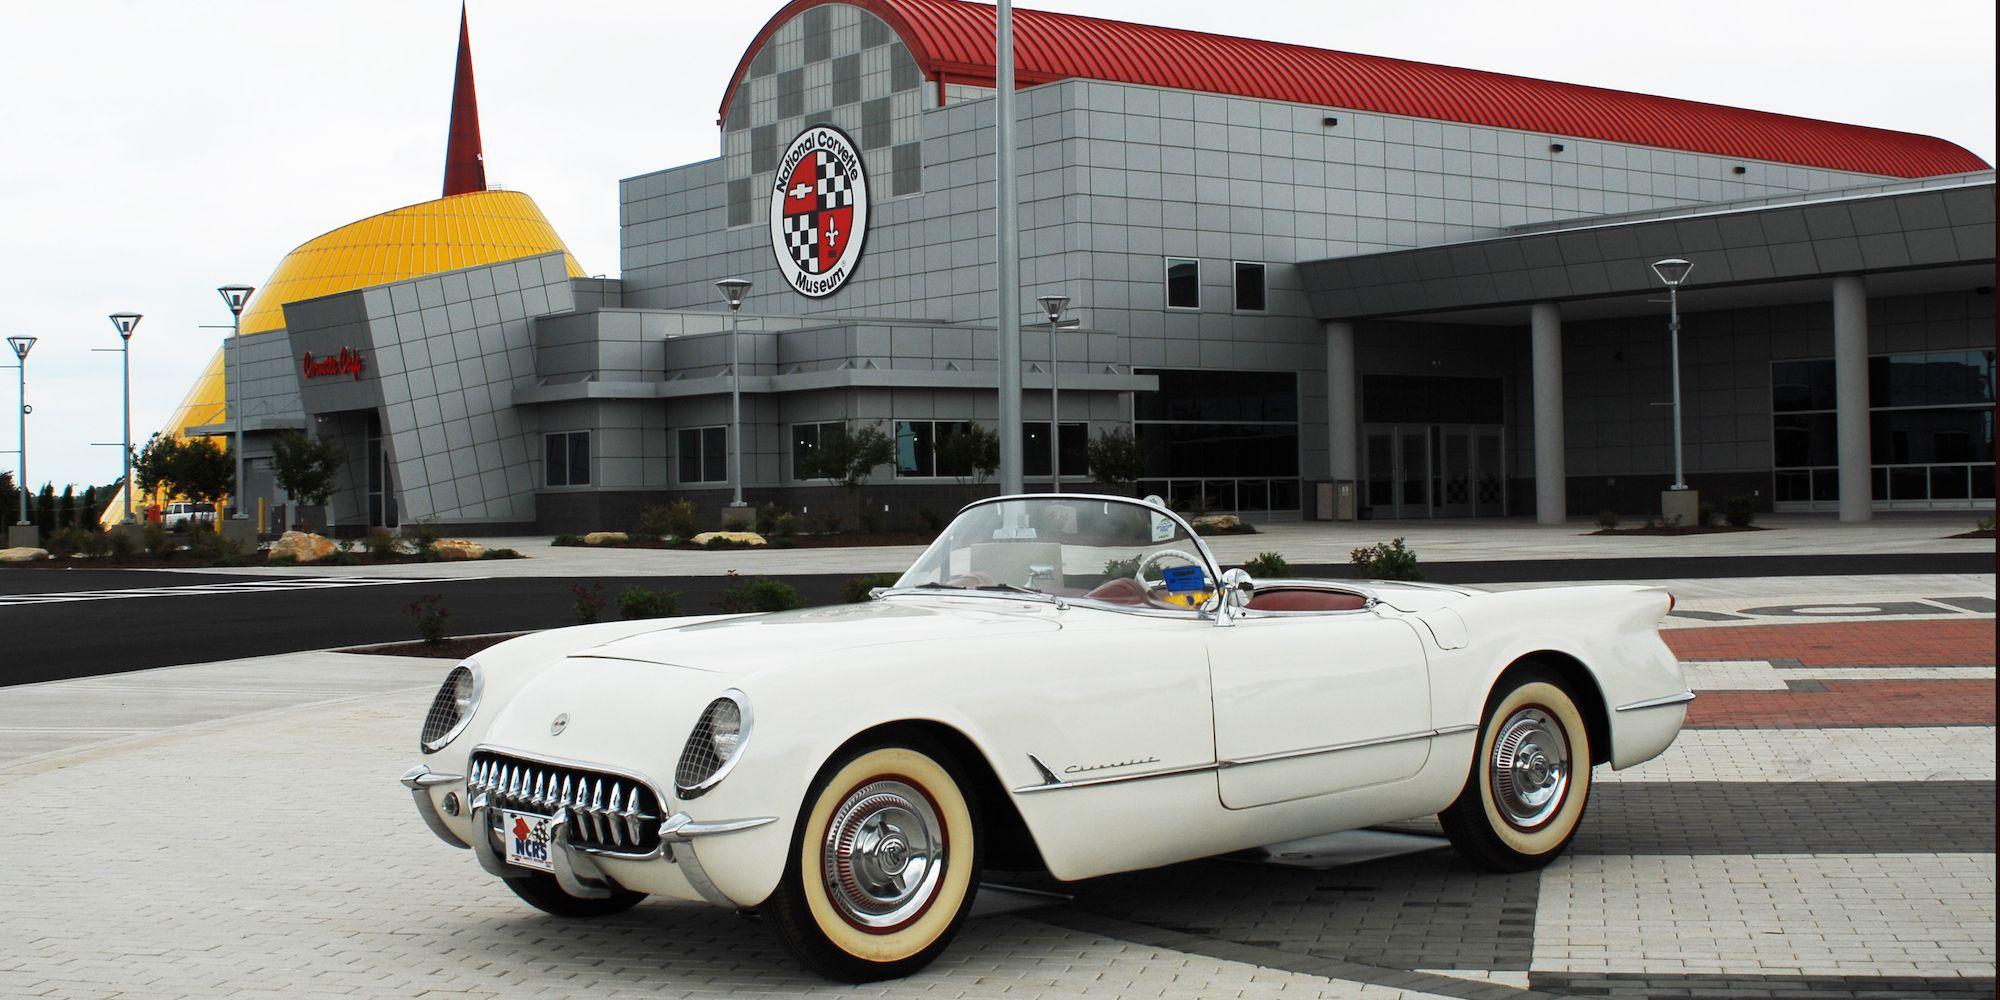 12 Best Car Museums - Best Automotive Museums in US